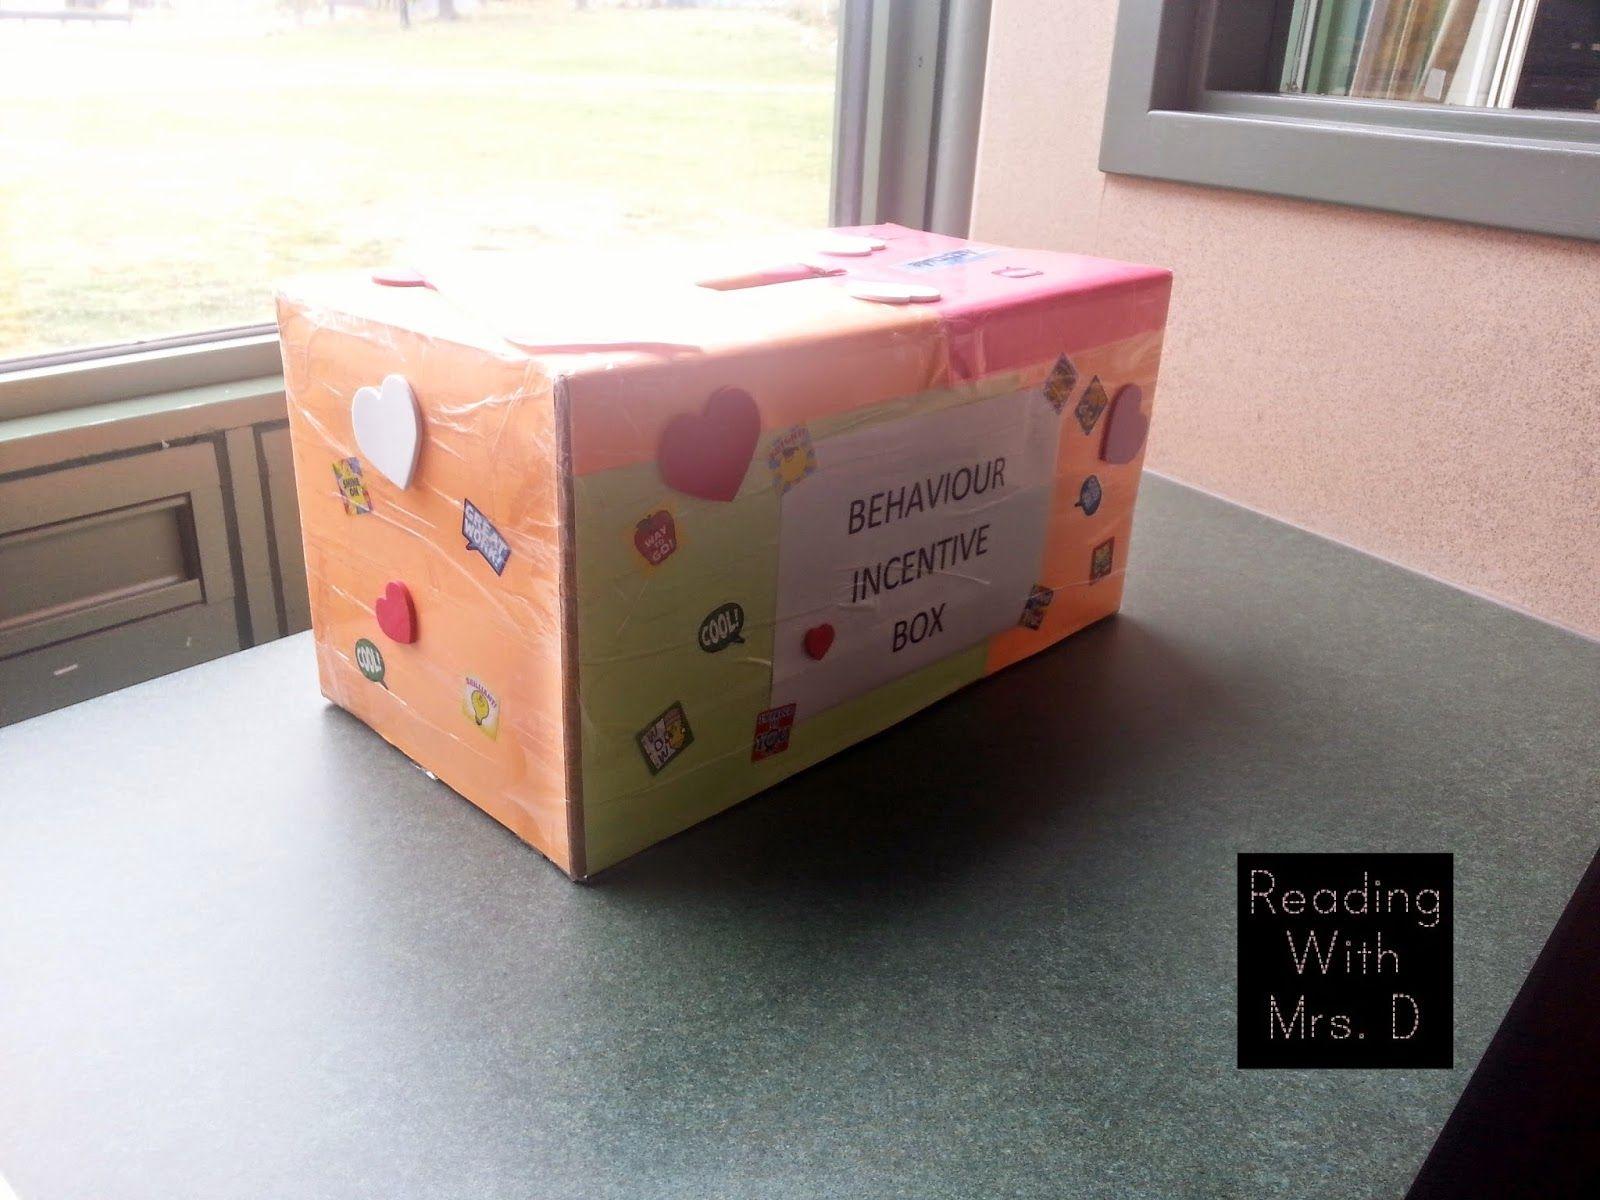 Behaviour Incentive Box